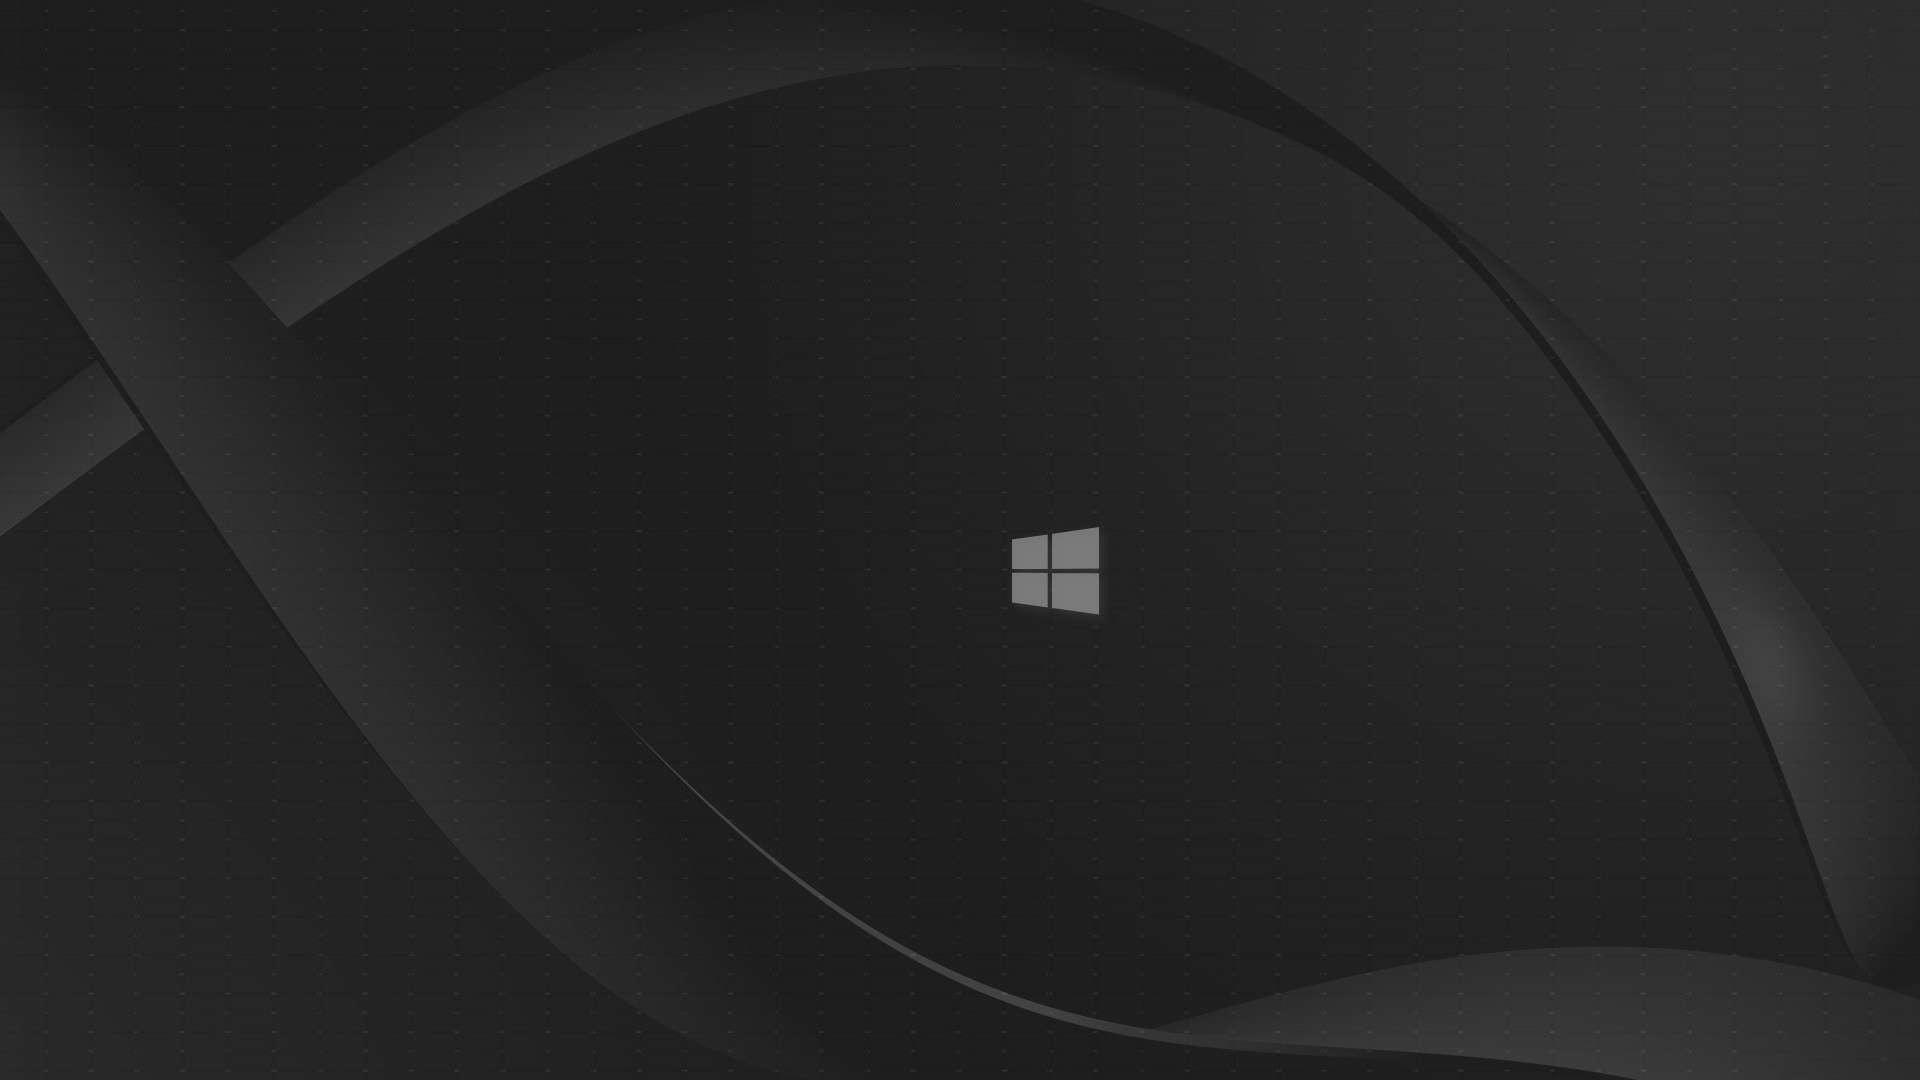 Black Windows 10 Wallpaper 1080p Nosirix